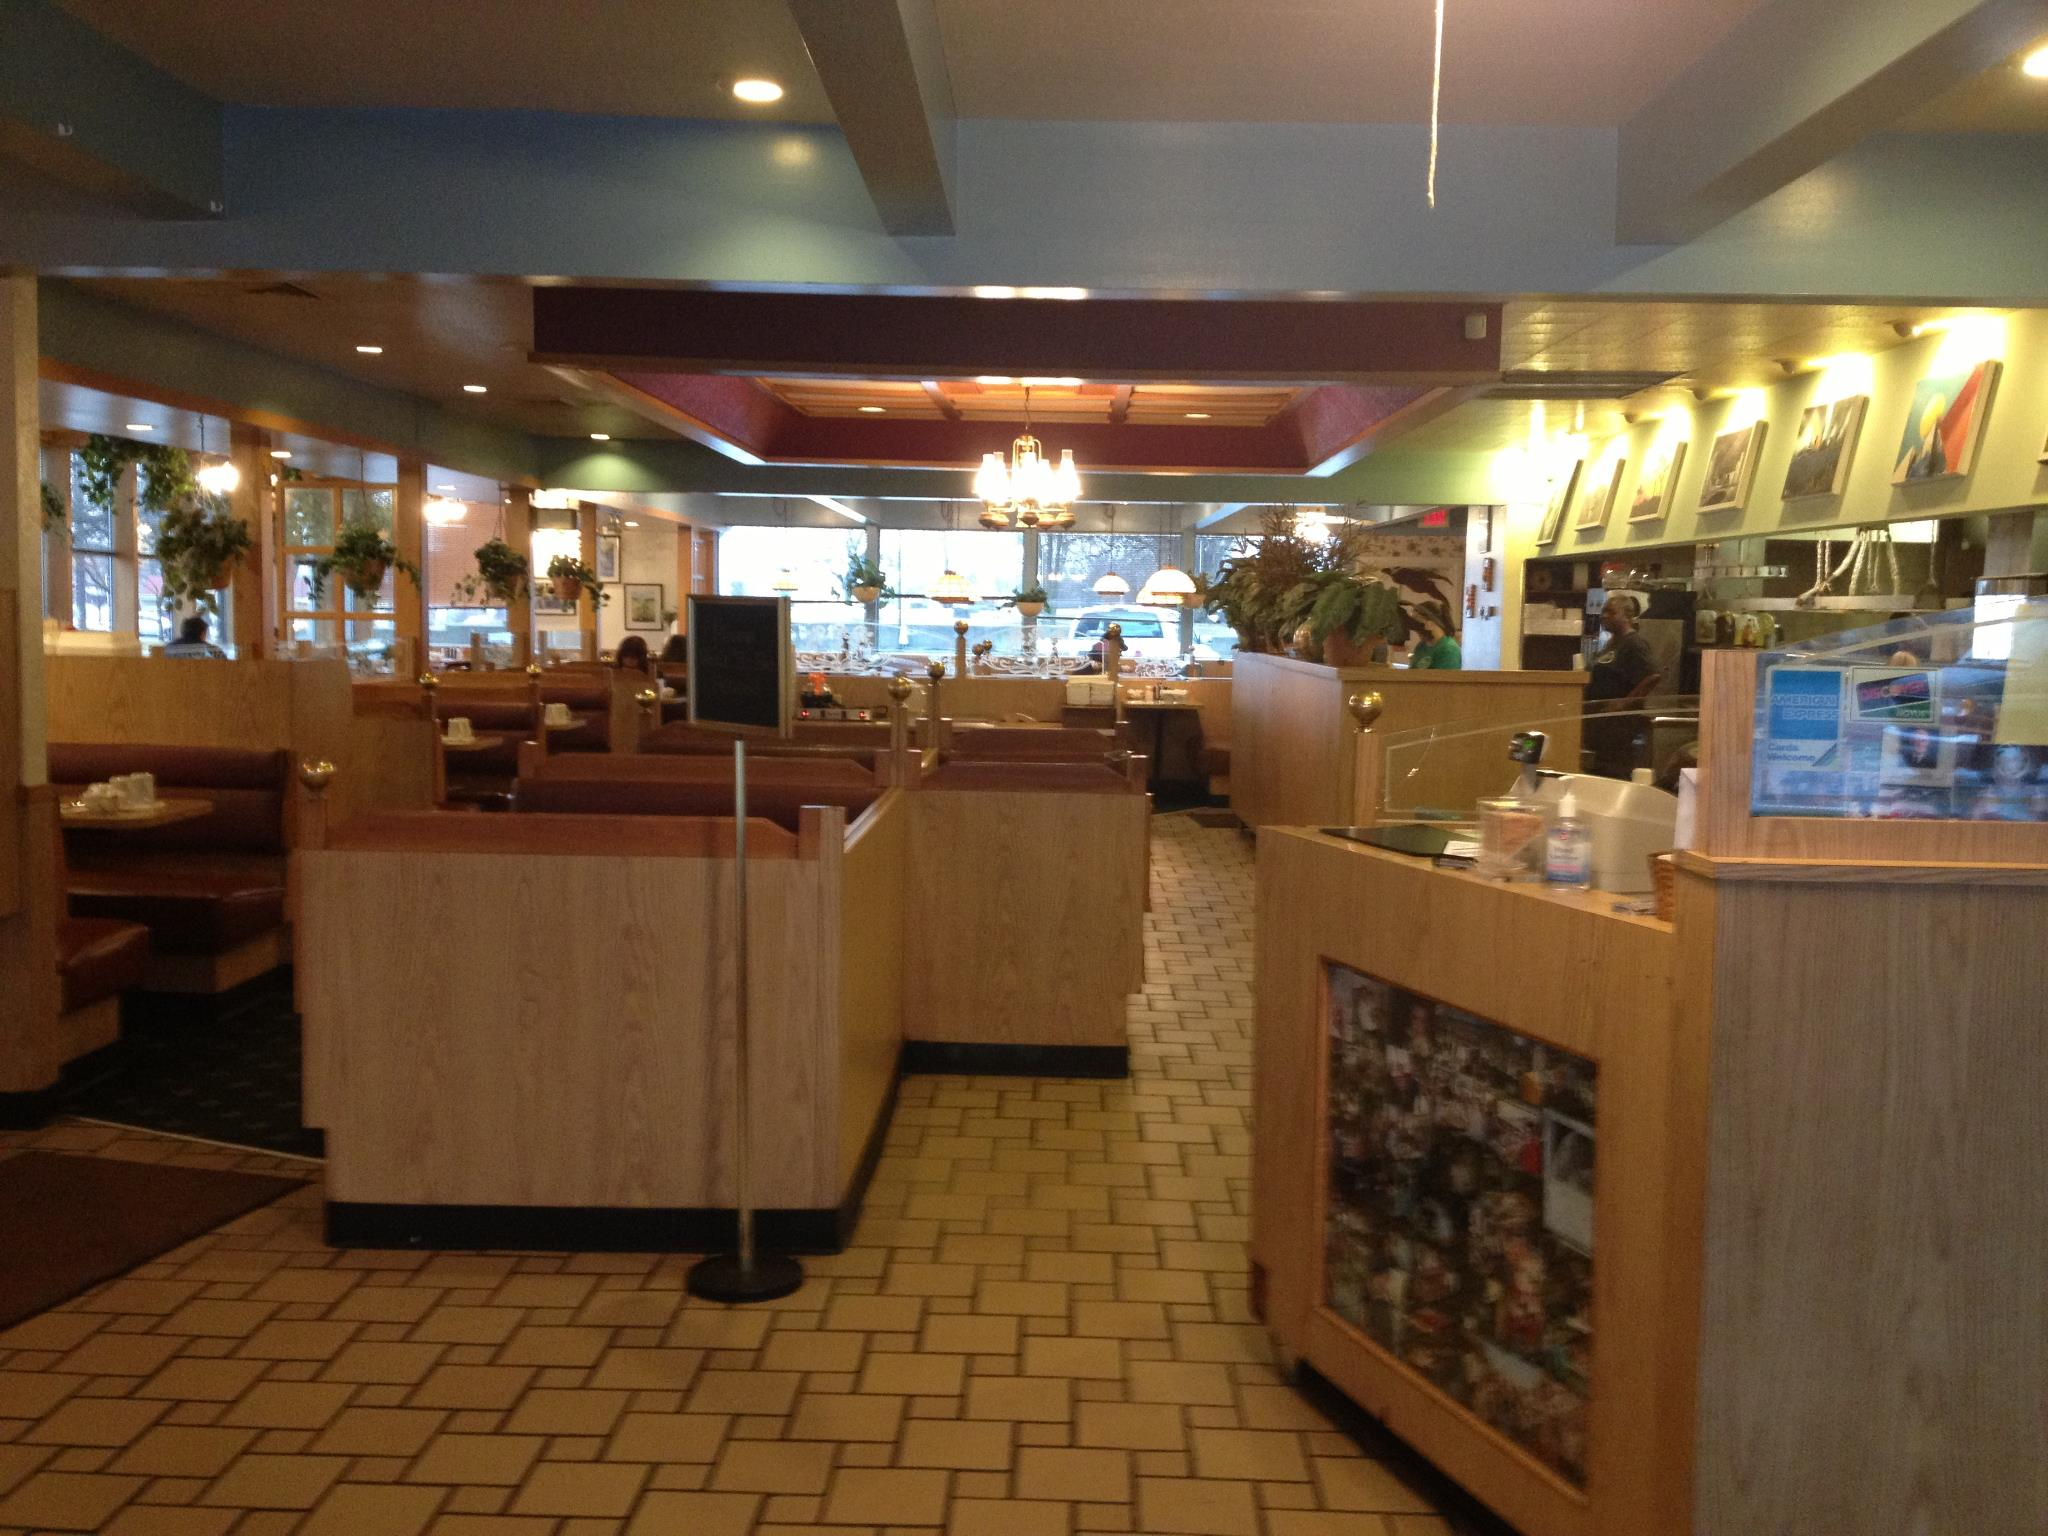 Aurora illinois area convention and visitors bureau visit eat nikarrys restaurant kristyandbryce Gallery